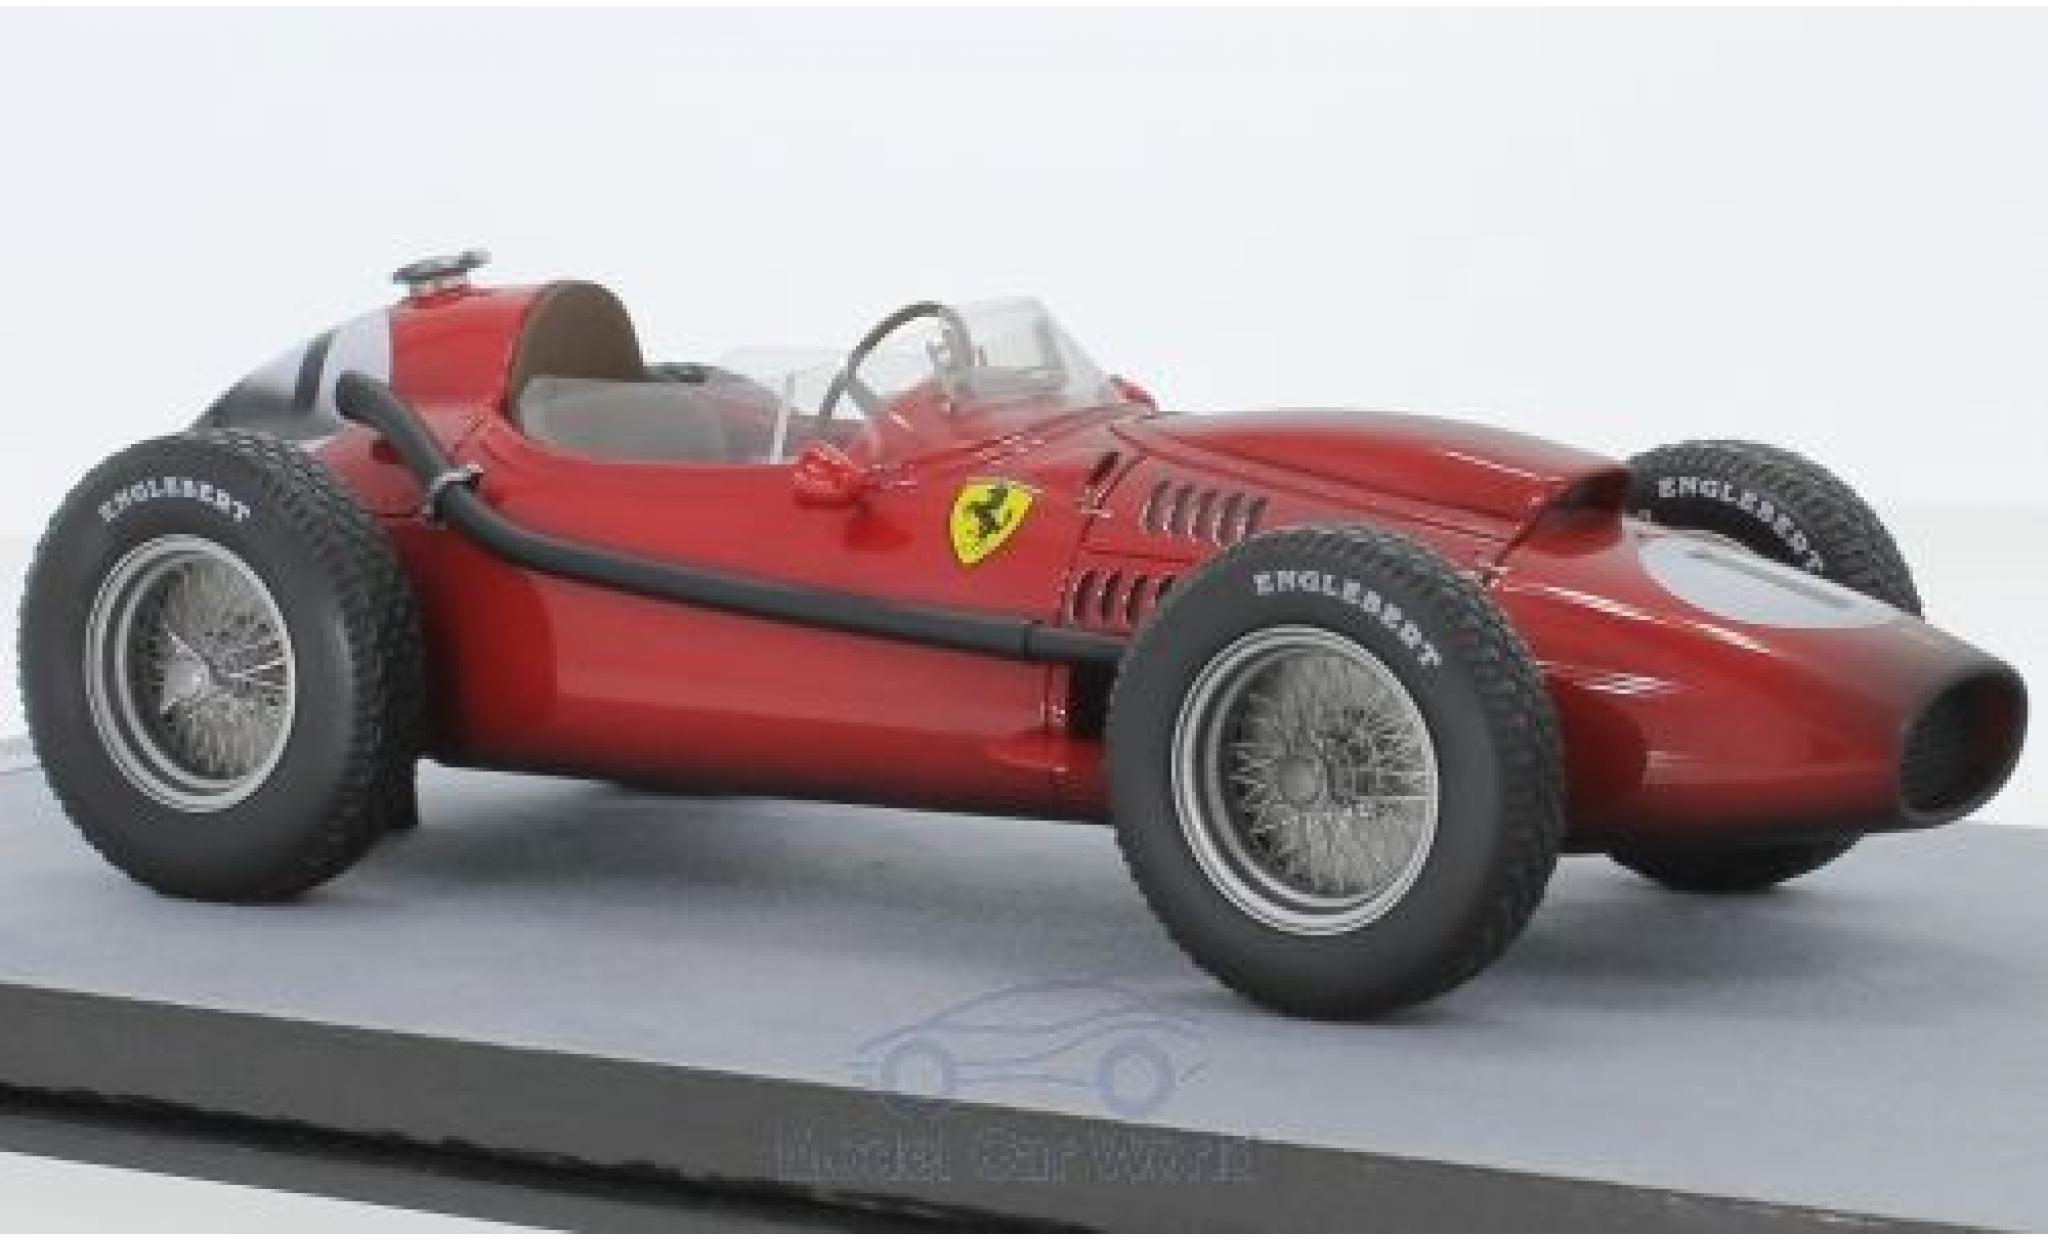 Ferrari Dino 1/18 Tecnomodel 246 F1 No.1 Formel 1 GP England 1958 Final Race Version P.Collins